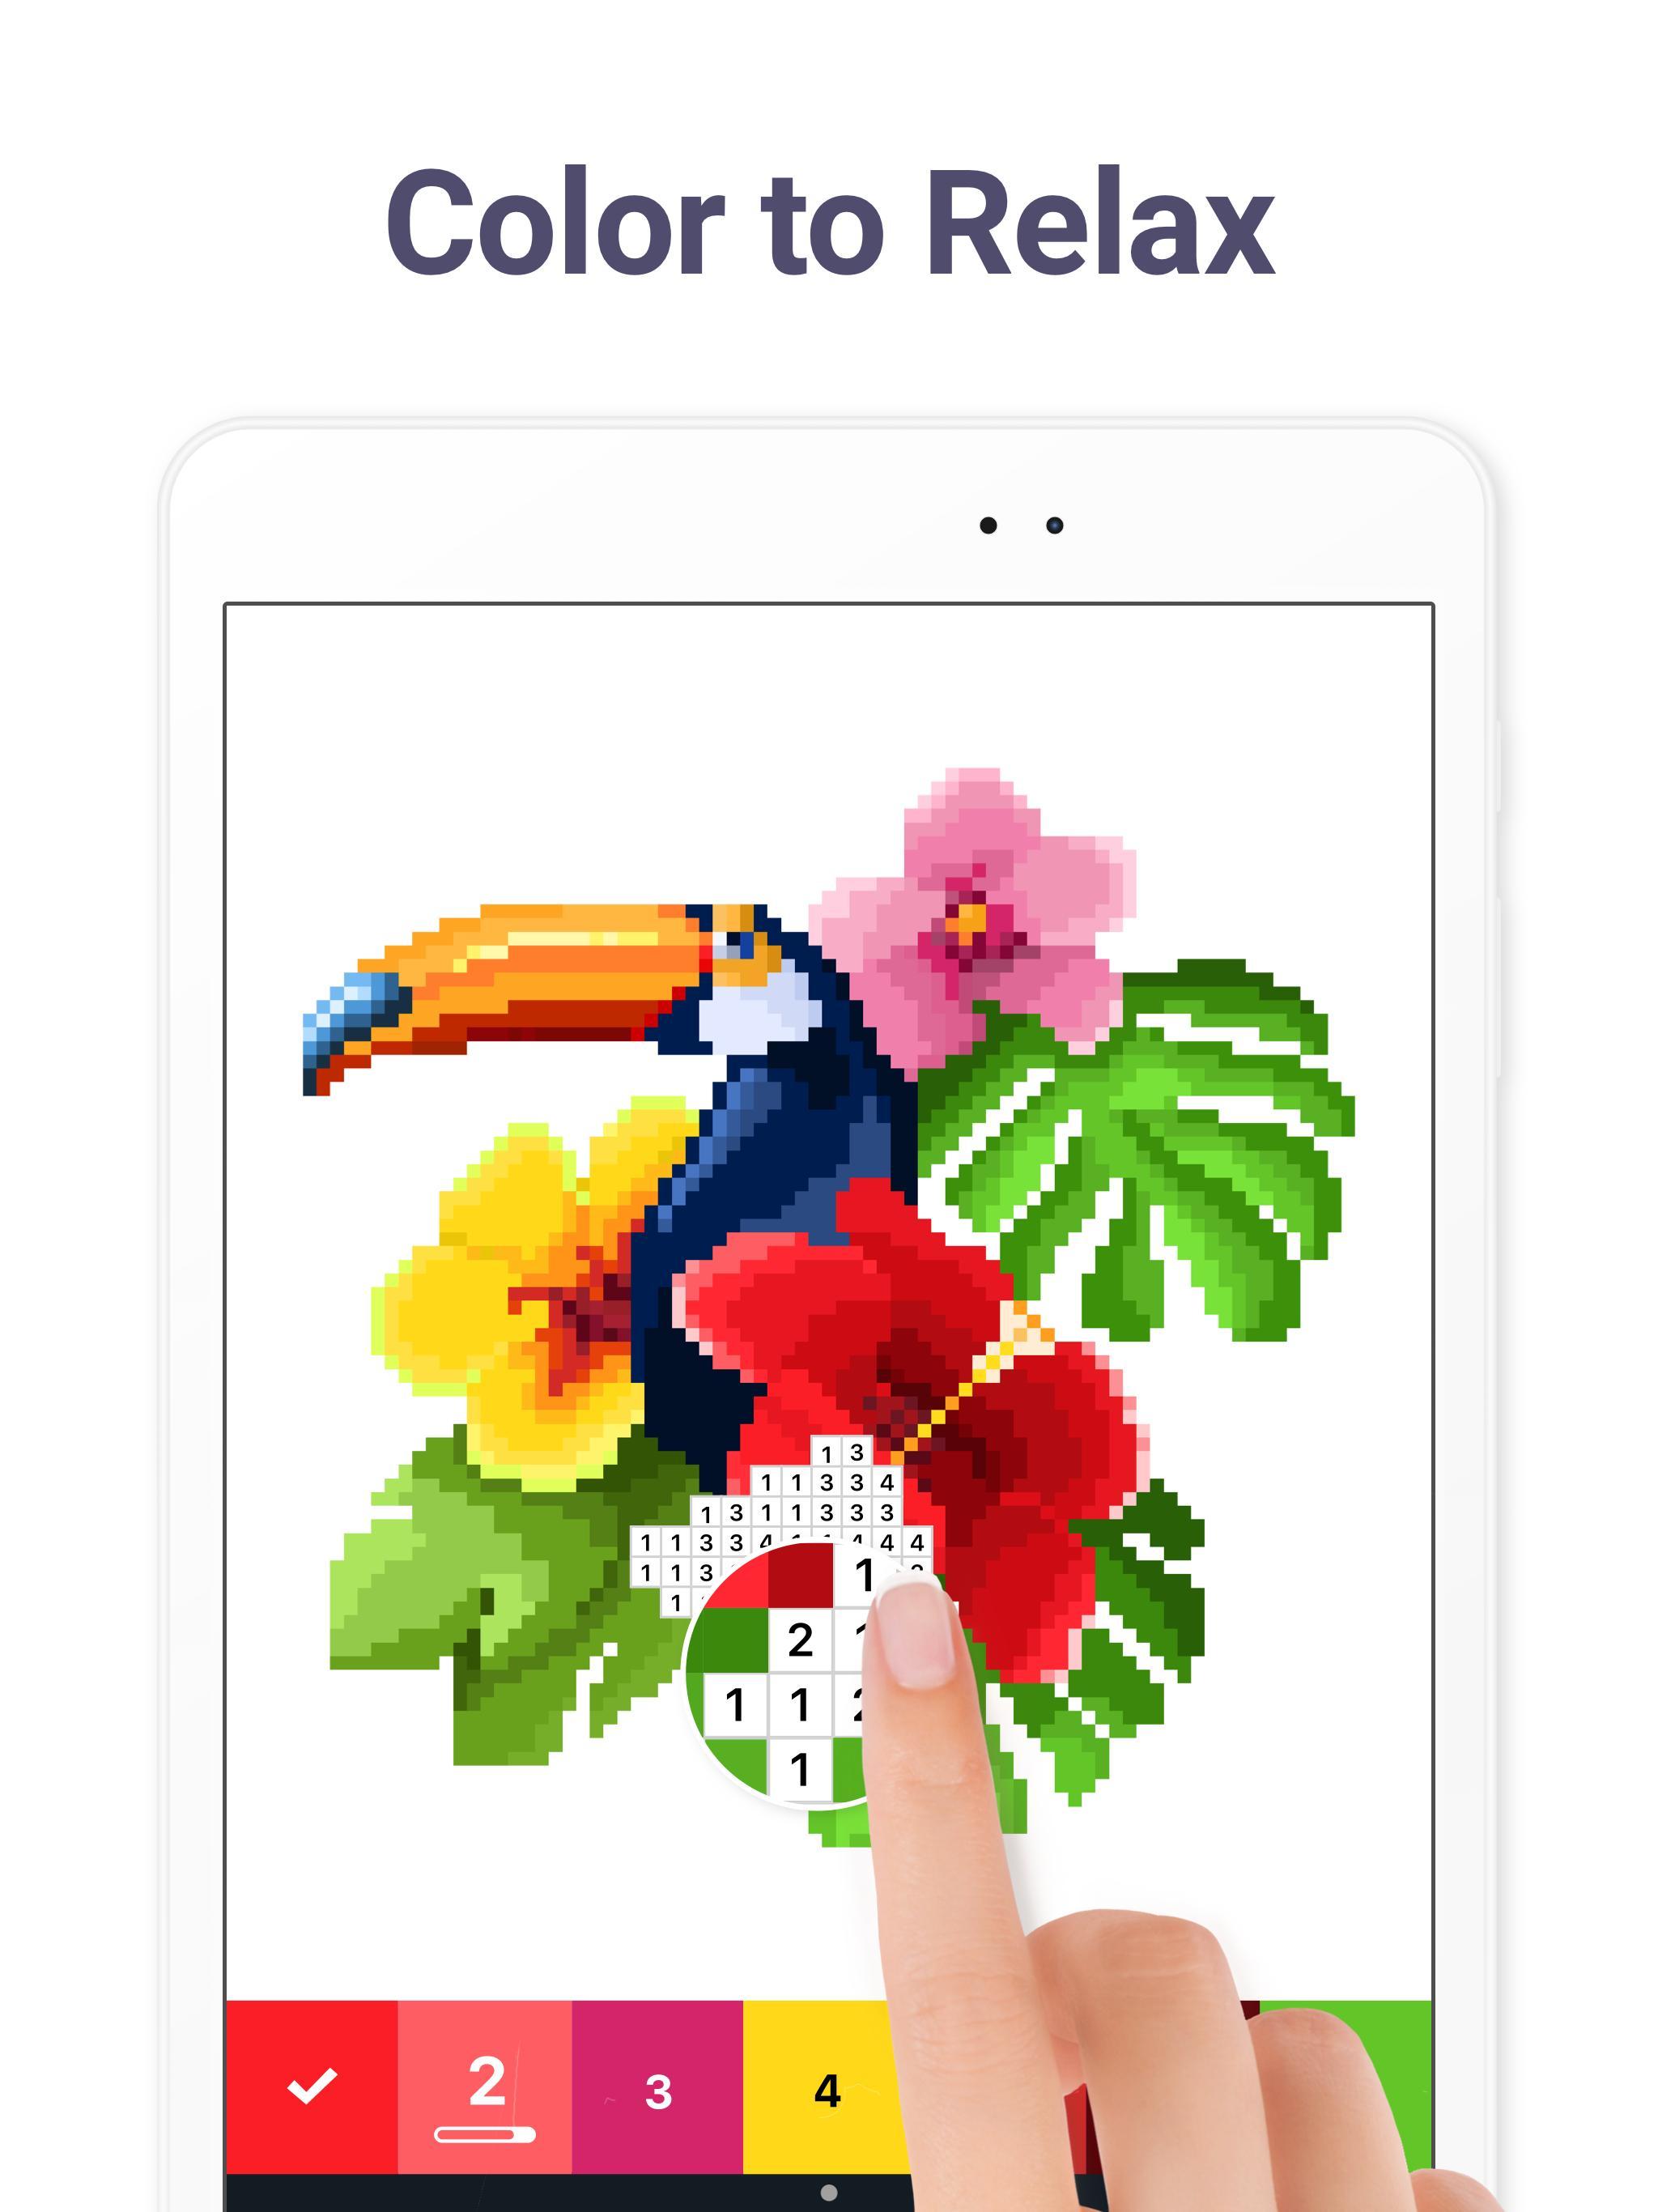 Pixel Art Color by Number 5.1.3 Screenshot 9